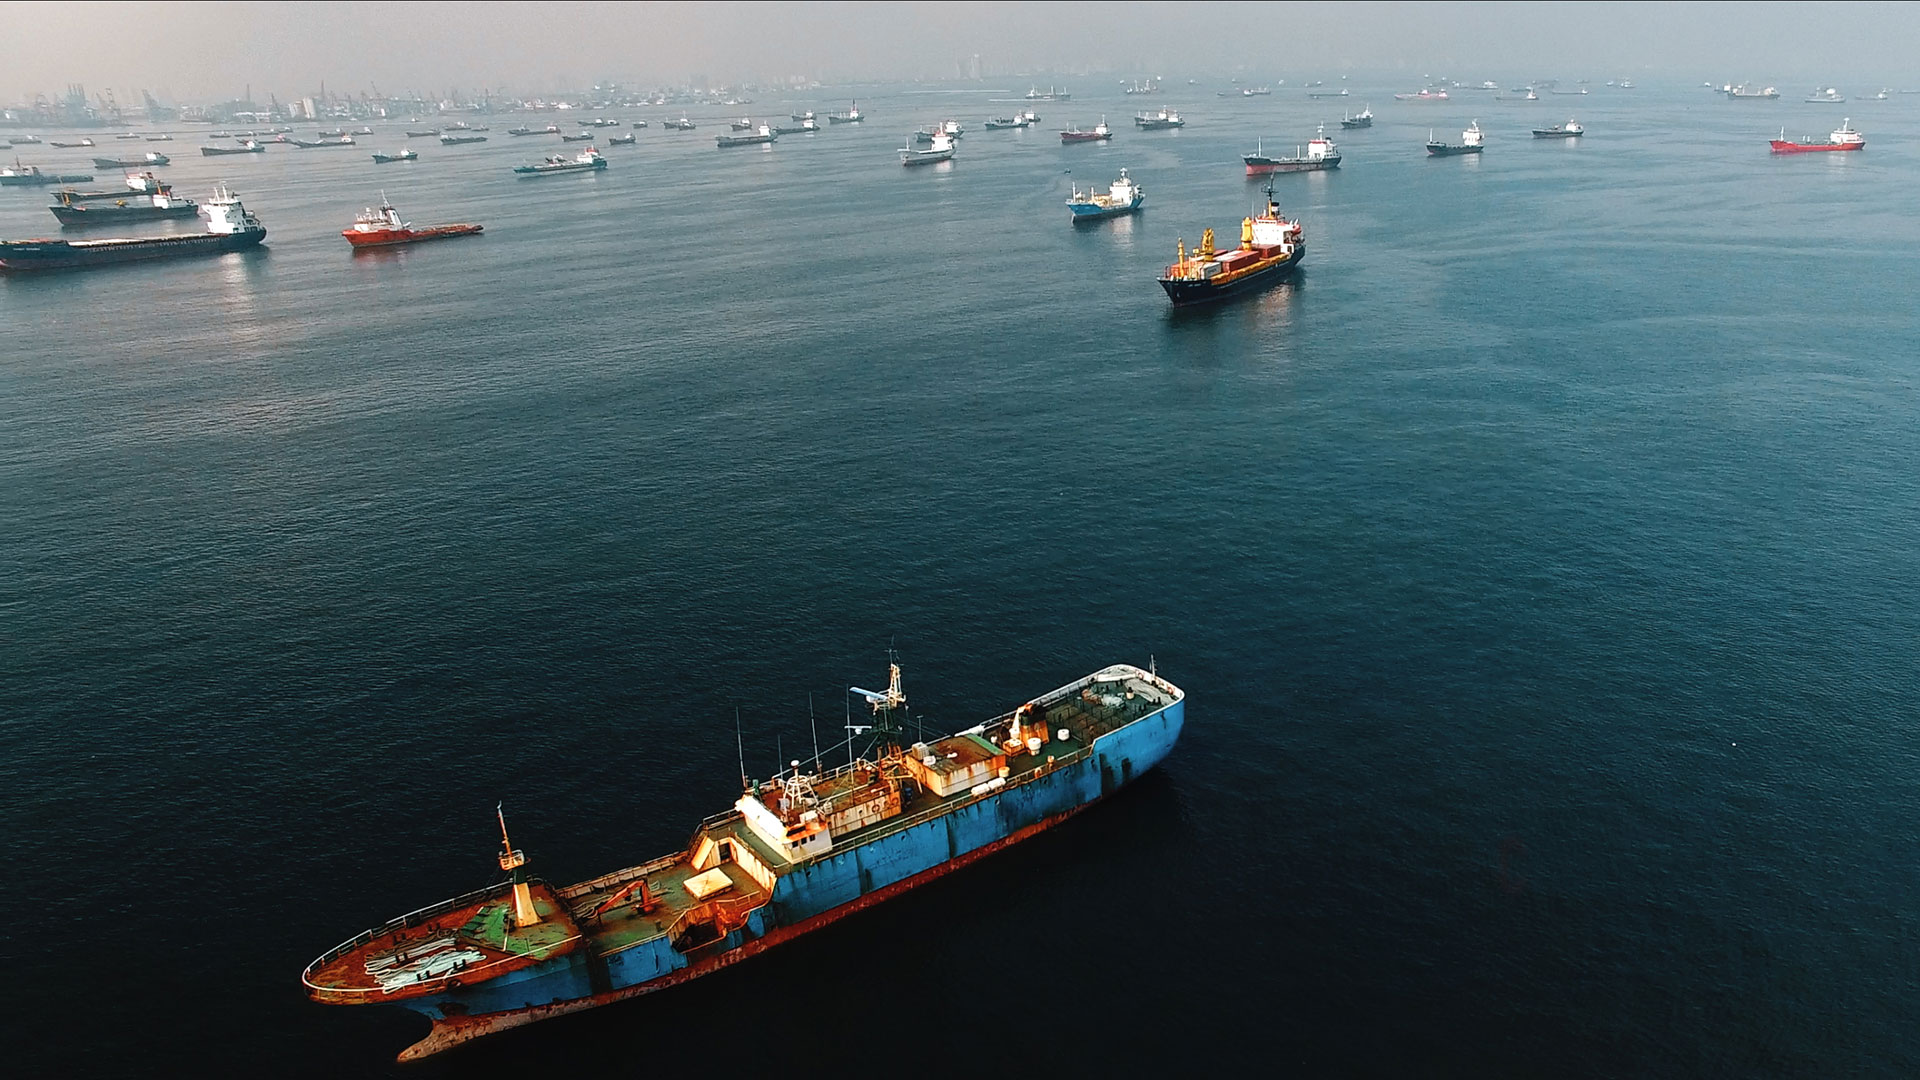 Seaspiracy: Fischerei Fischerboote